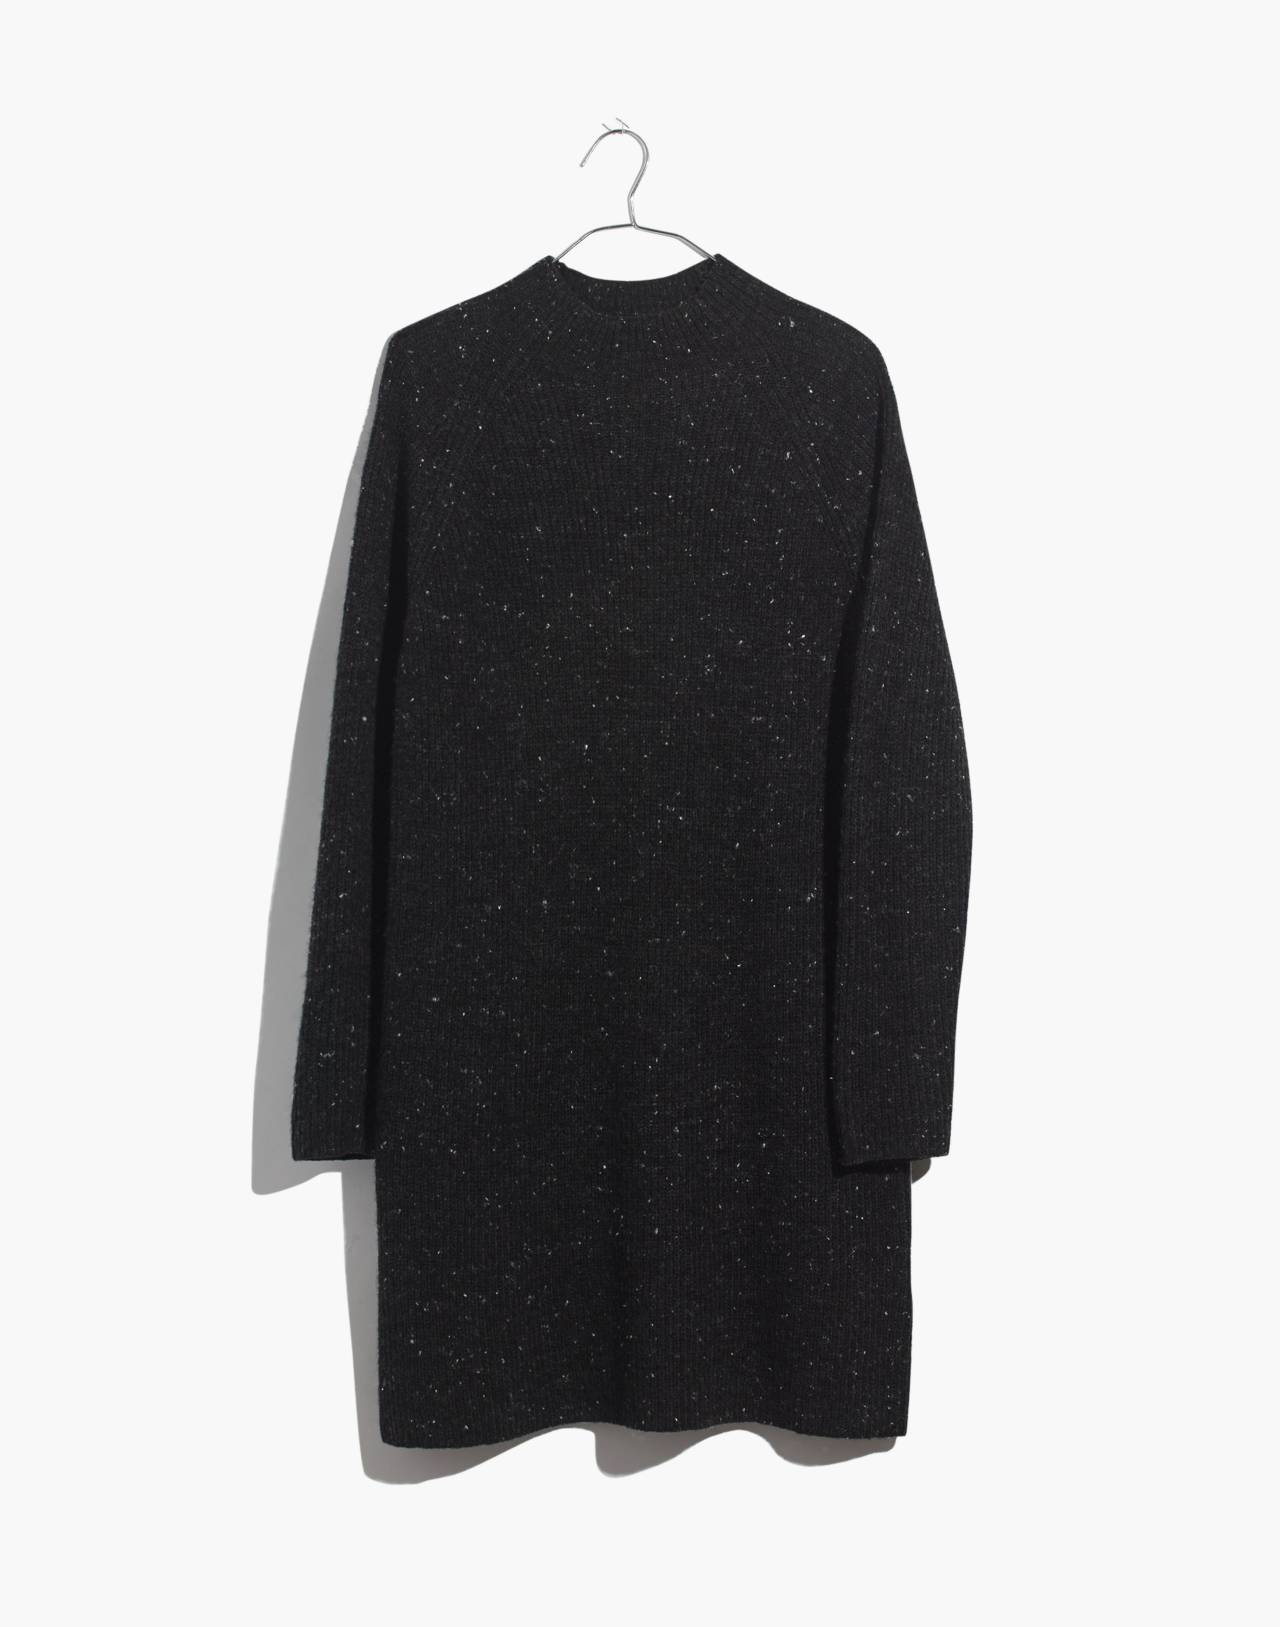 Donegal Northfield Mockneck Sweater-Dress in Coziest Yarn in donegal storm image 4